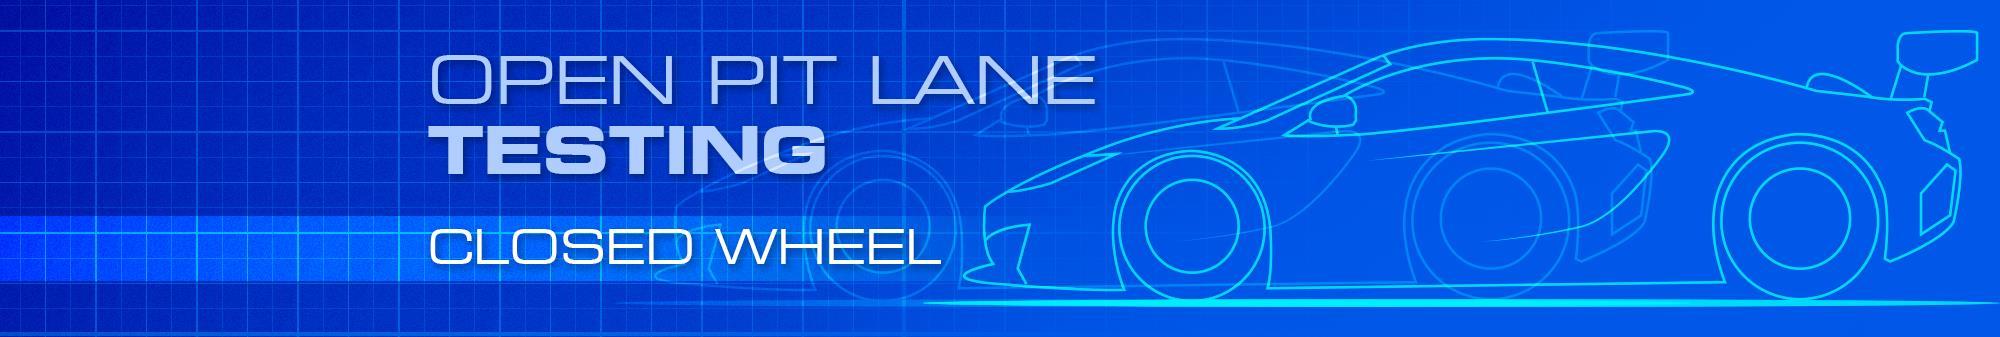 OPL Testing - BTCC & Support